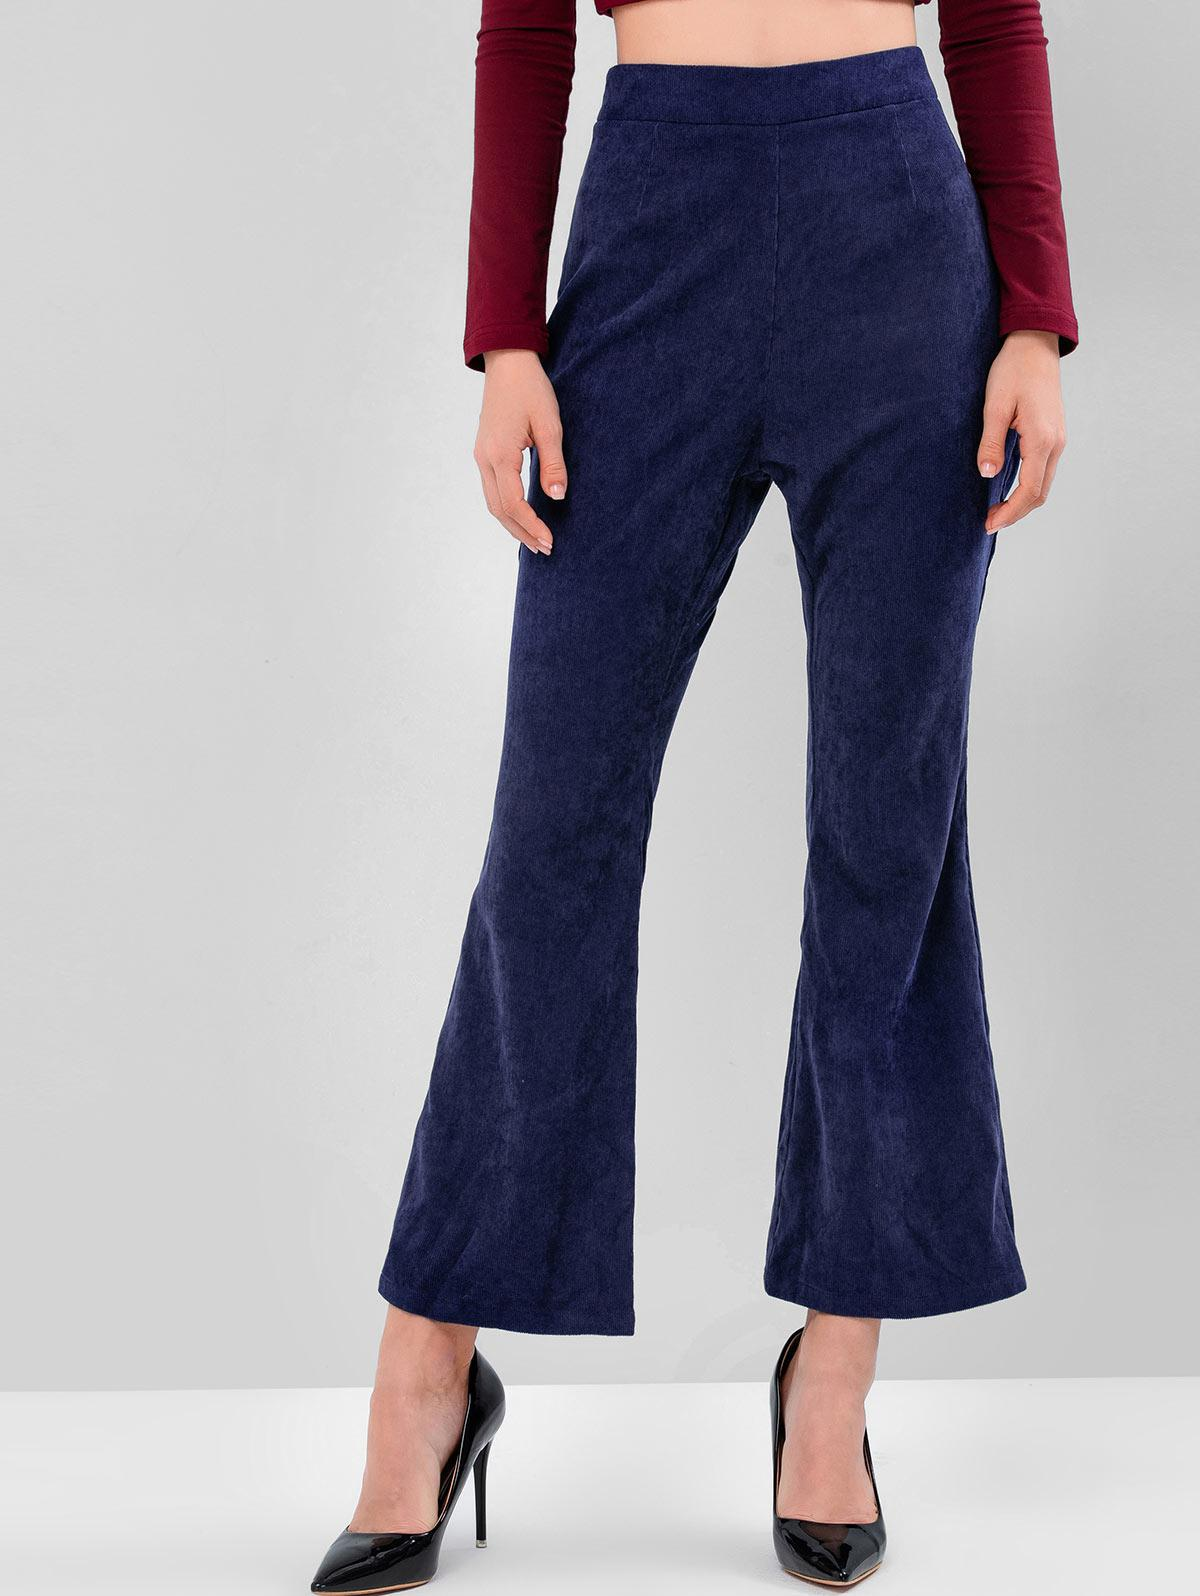 ZAFUL Side Zipper High Waisted Corduroy Flare Pants